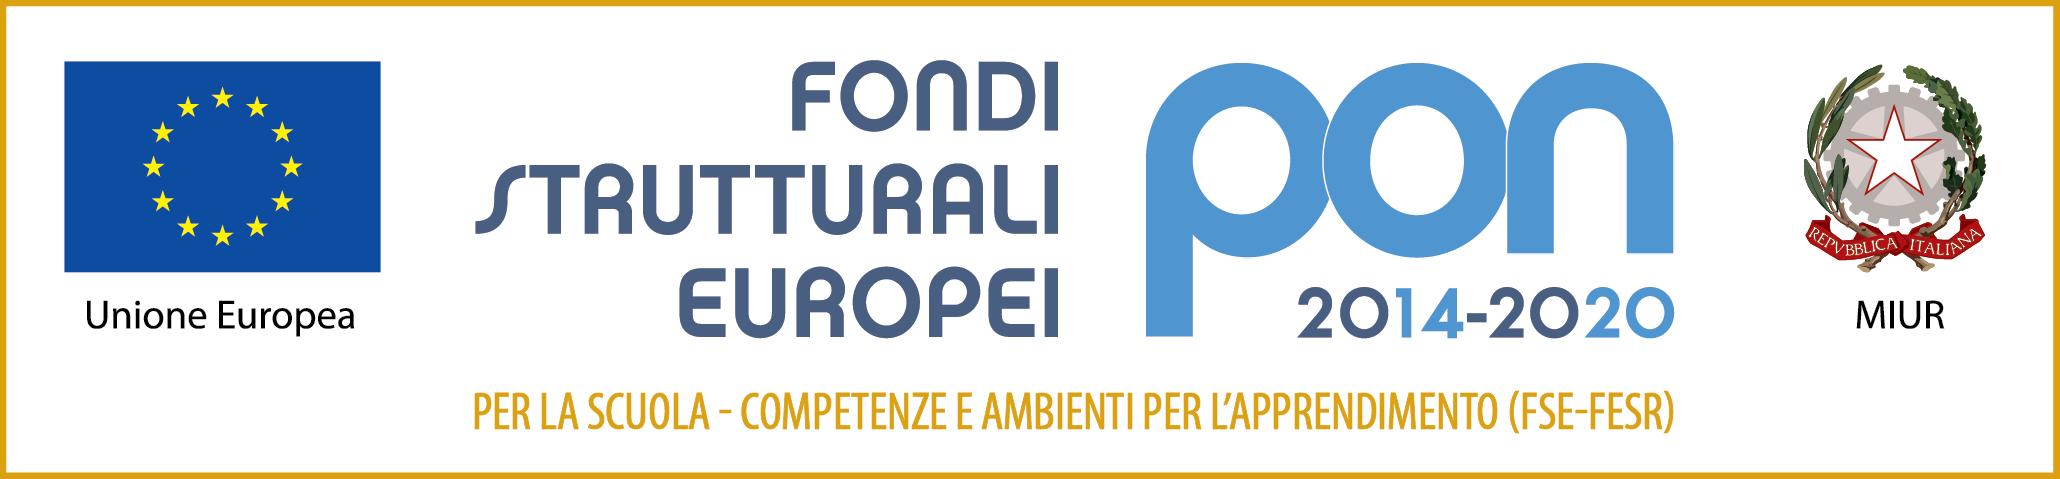 Loghi PON 2014-2020